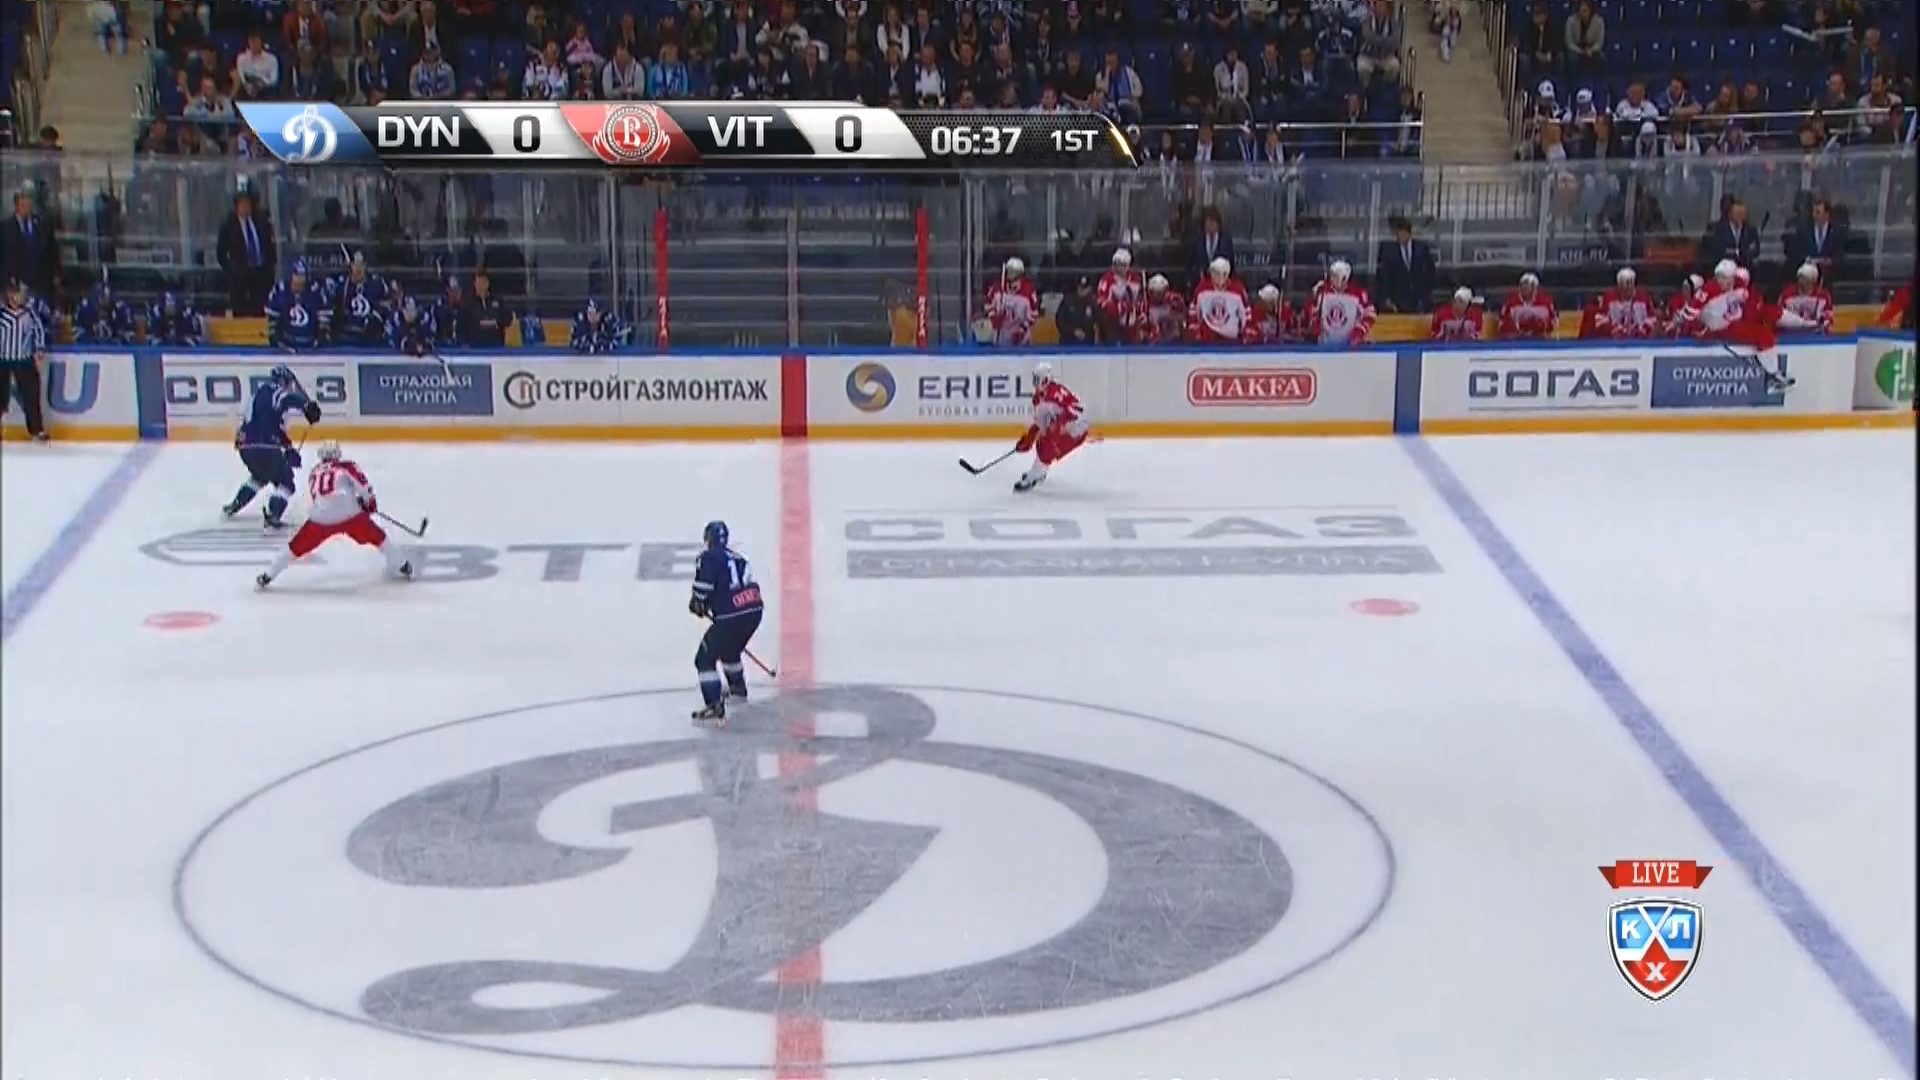 KHL.2015.09.04.DynM@Vityaz.1080p25.mkv_20150905_154806.515.jpg